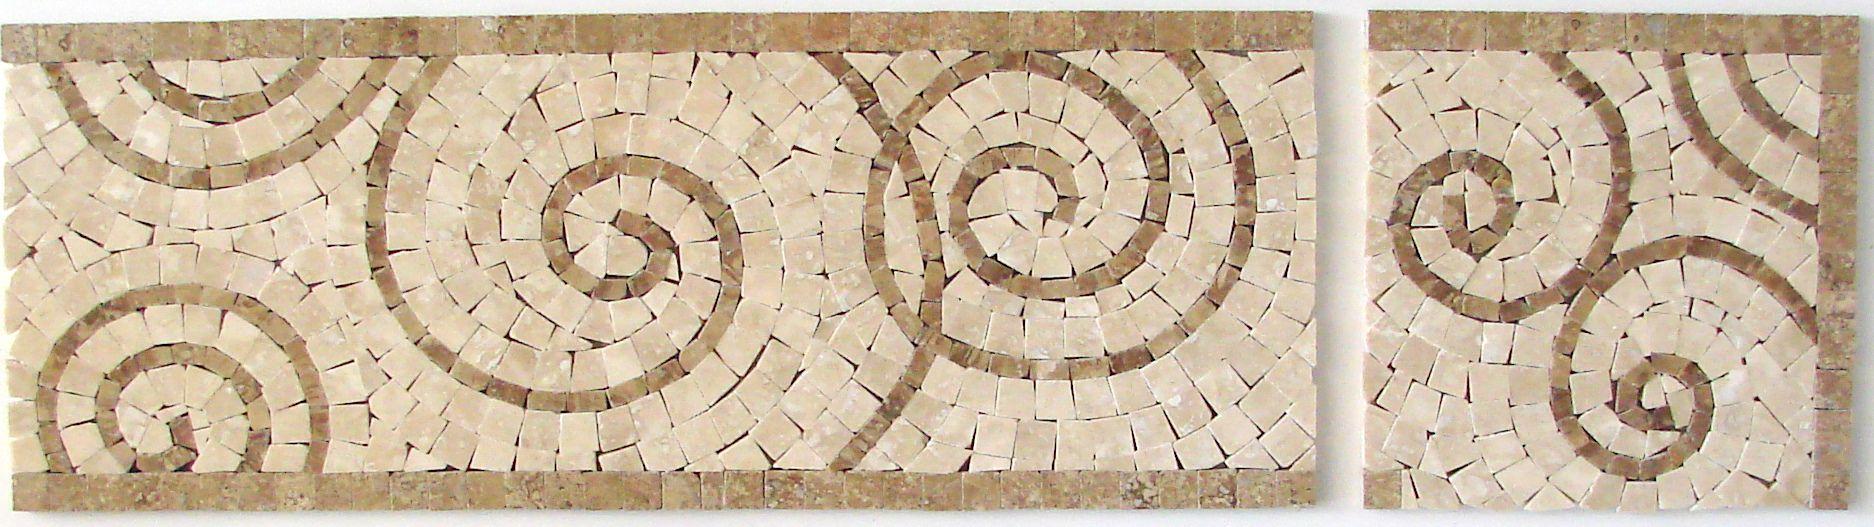 mosaic border patterns google search